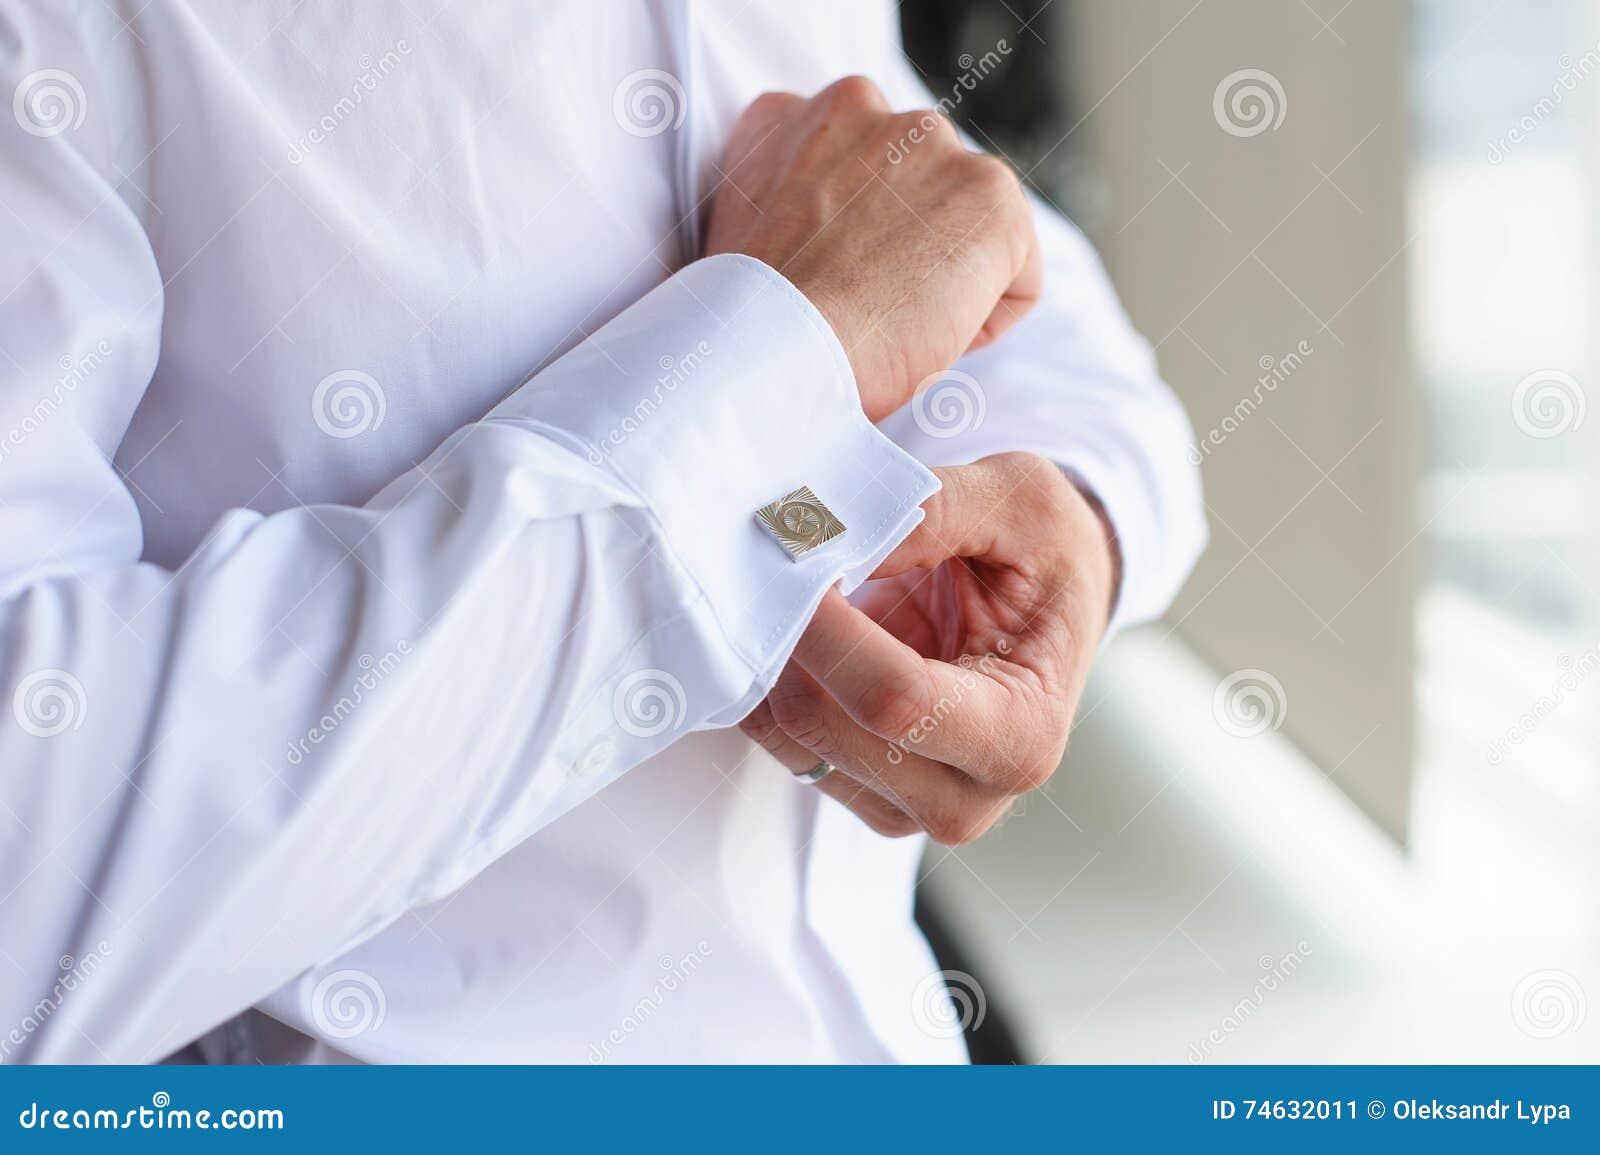 eafbac53ecdb Αρσενικά μανικετόκουμπα κουμπιών Ο επιχειρηματίας κουμπώνει τα  μανικετόκουμπα στο άσπρο πουκάμισο Ο νεόνυμφος το πρωί φορά το πουκάμισο σε  έναν γάμο